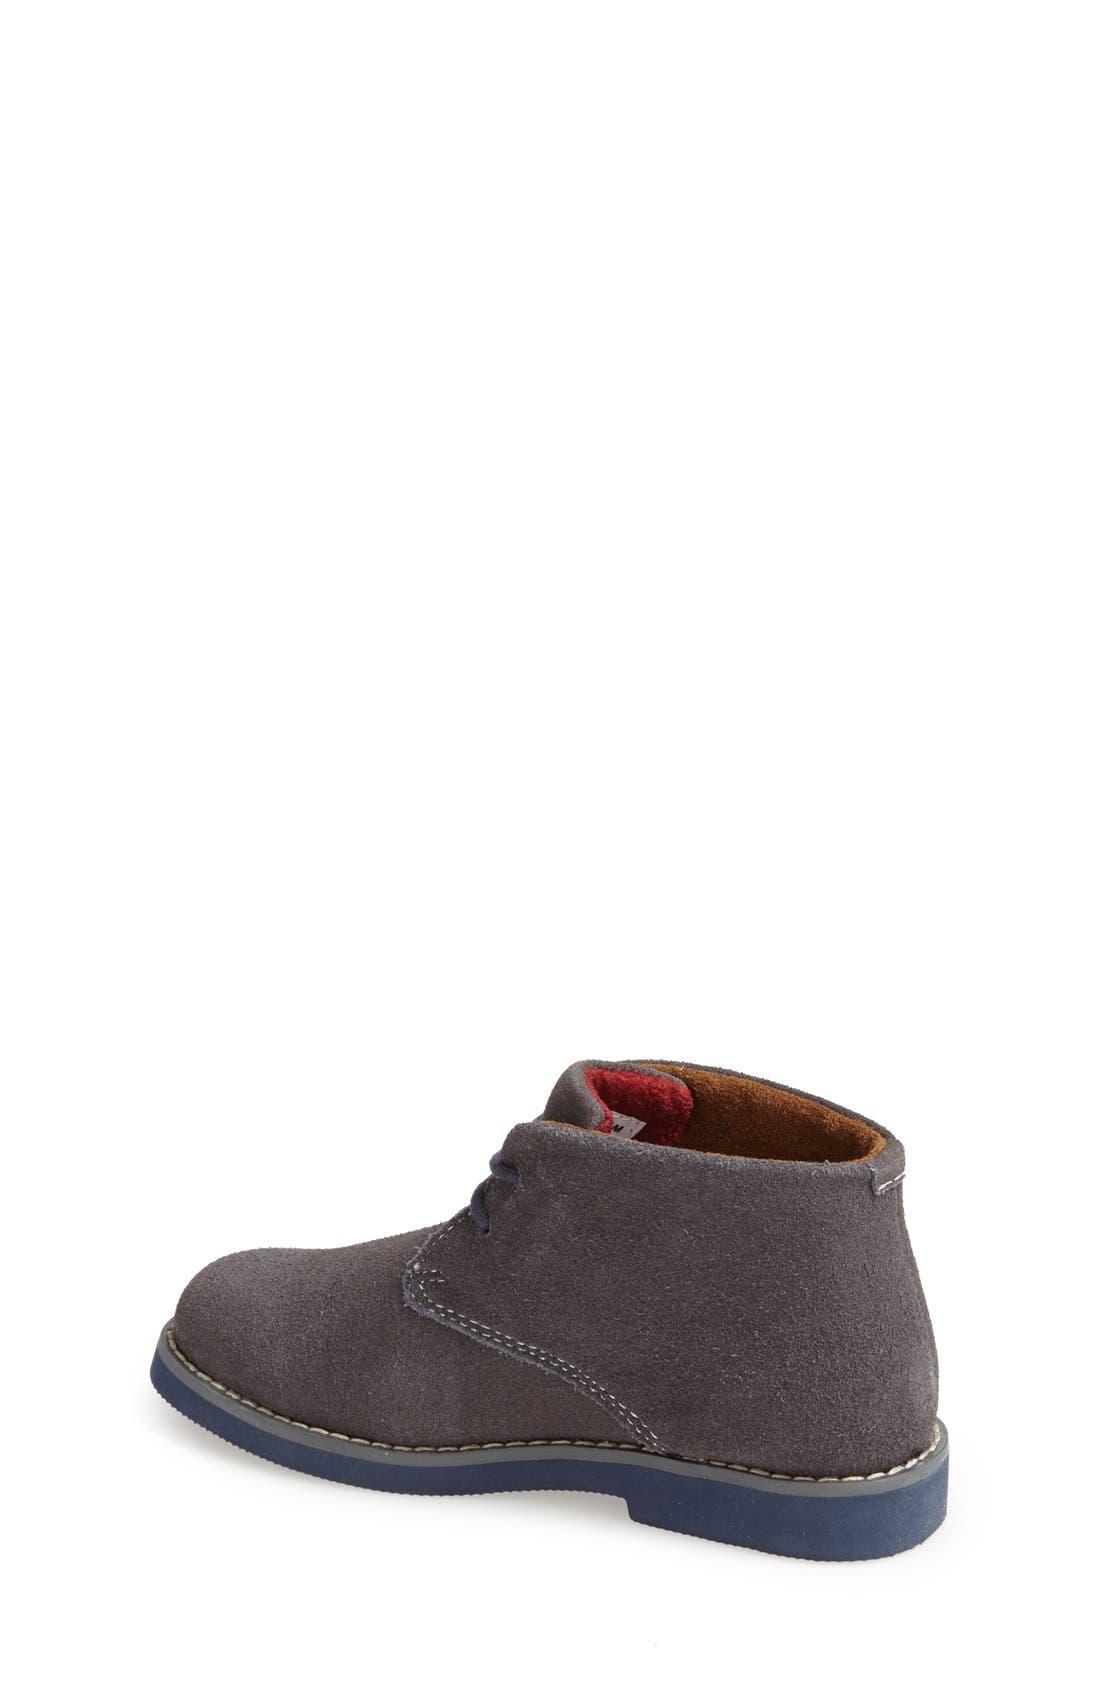 'Quinlan' Chukka Boot,                             Alternate thumbnail 2, color,                             Grey/ Navy Sole